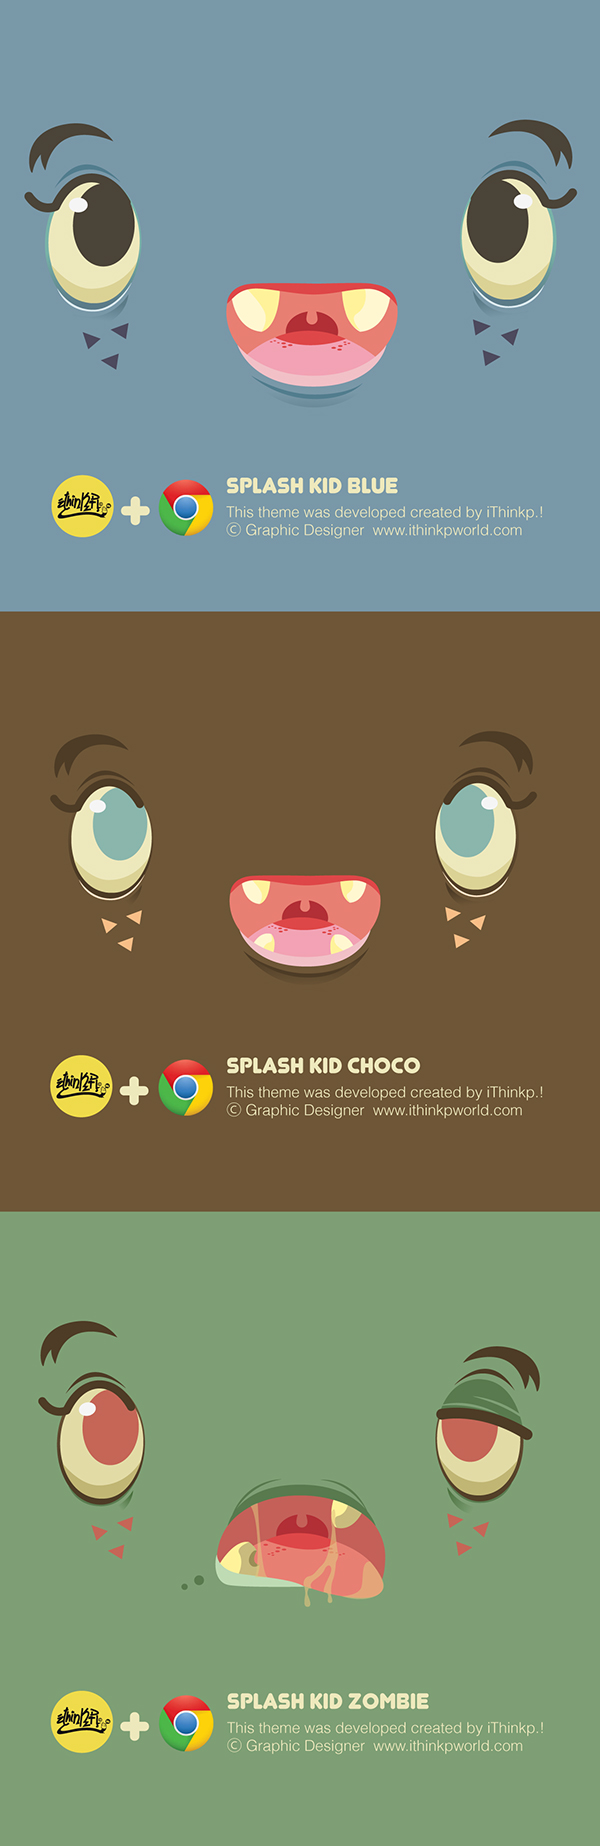 Google chrome themes zombie - Splash Kid Zombie Theme